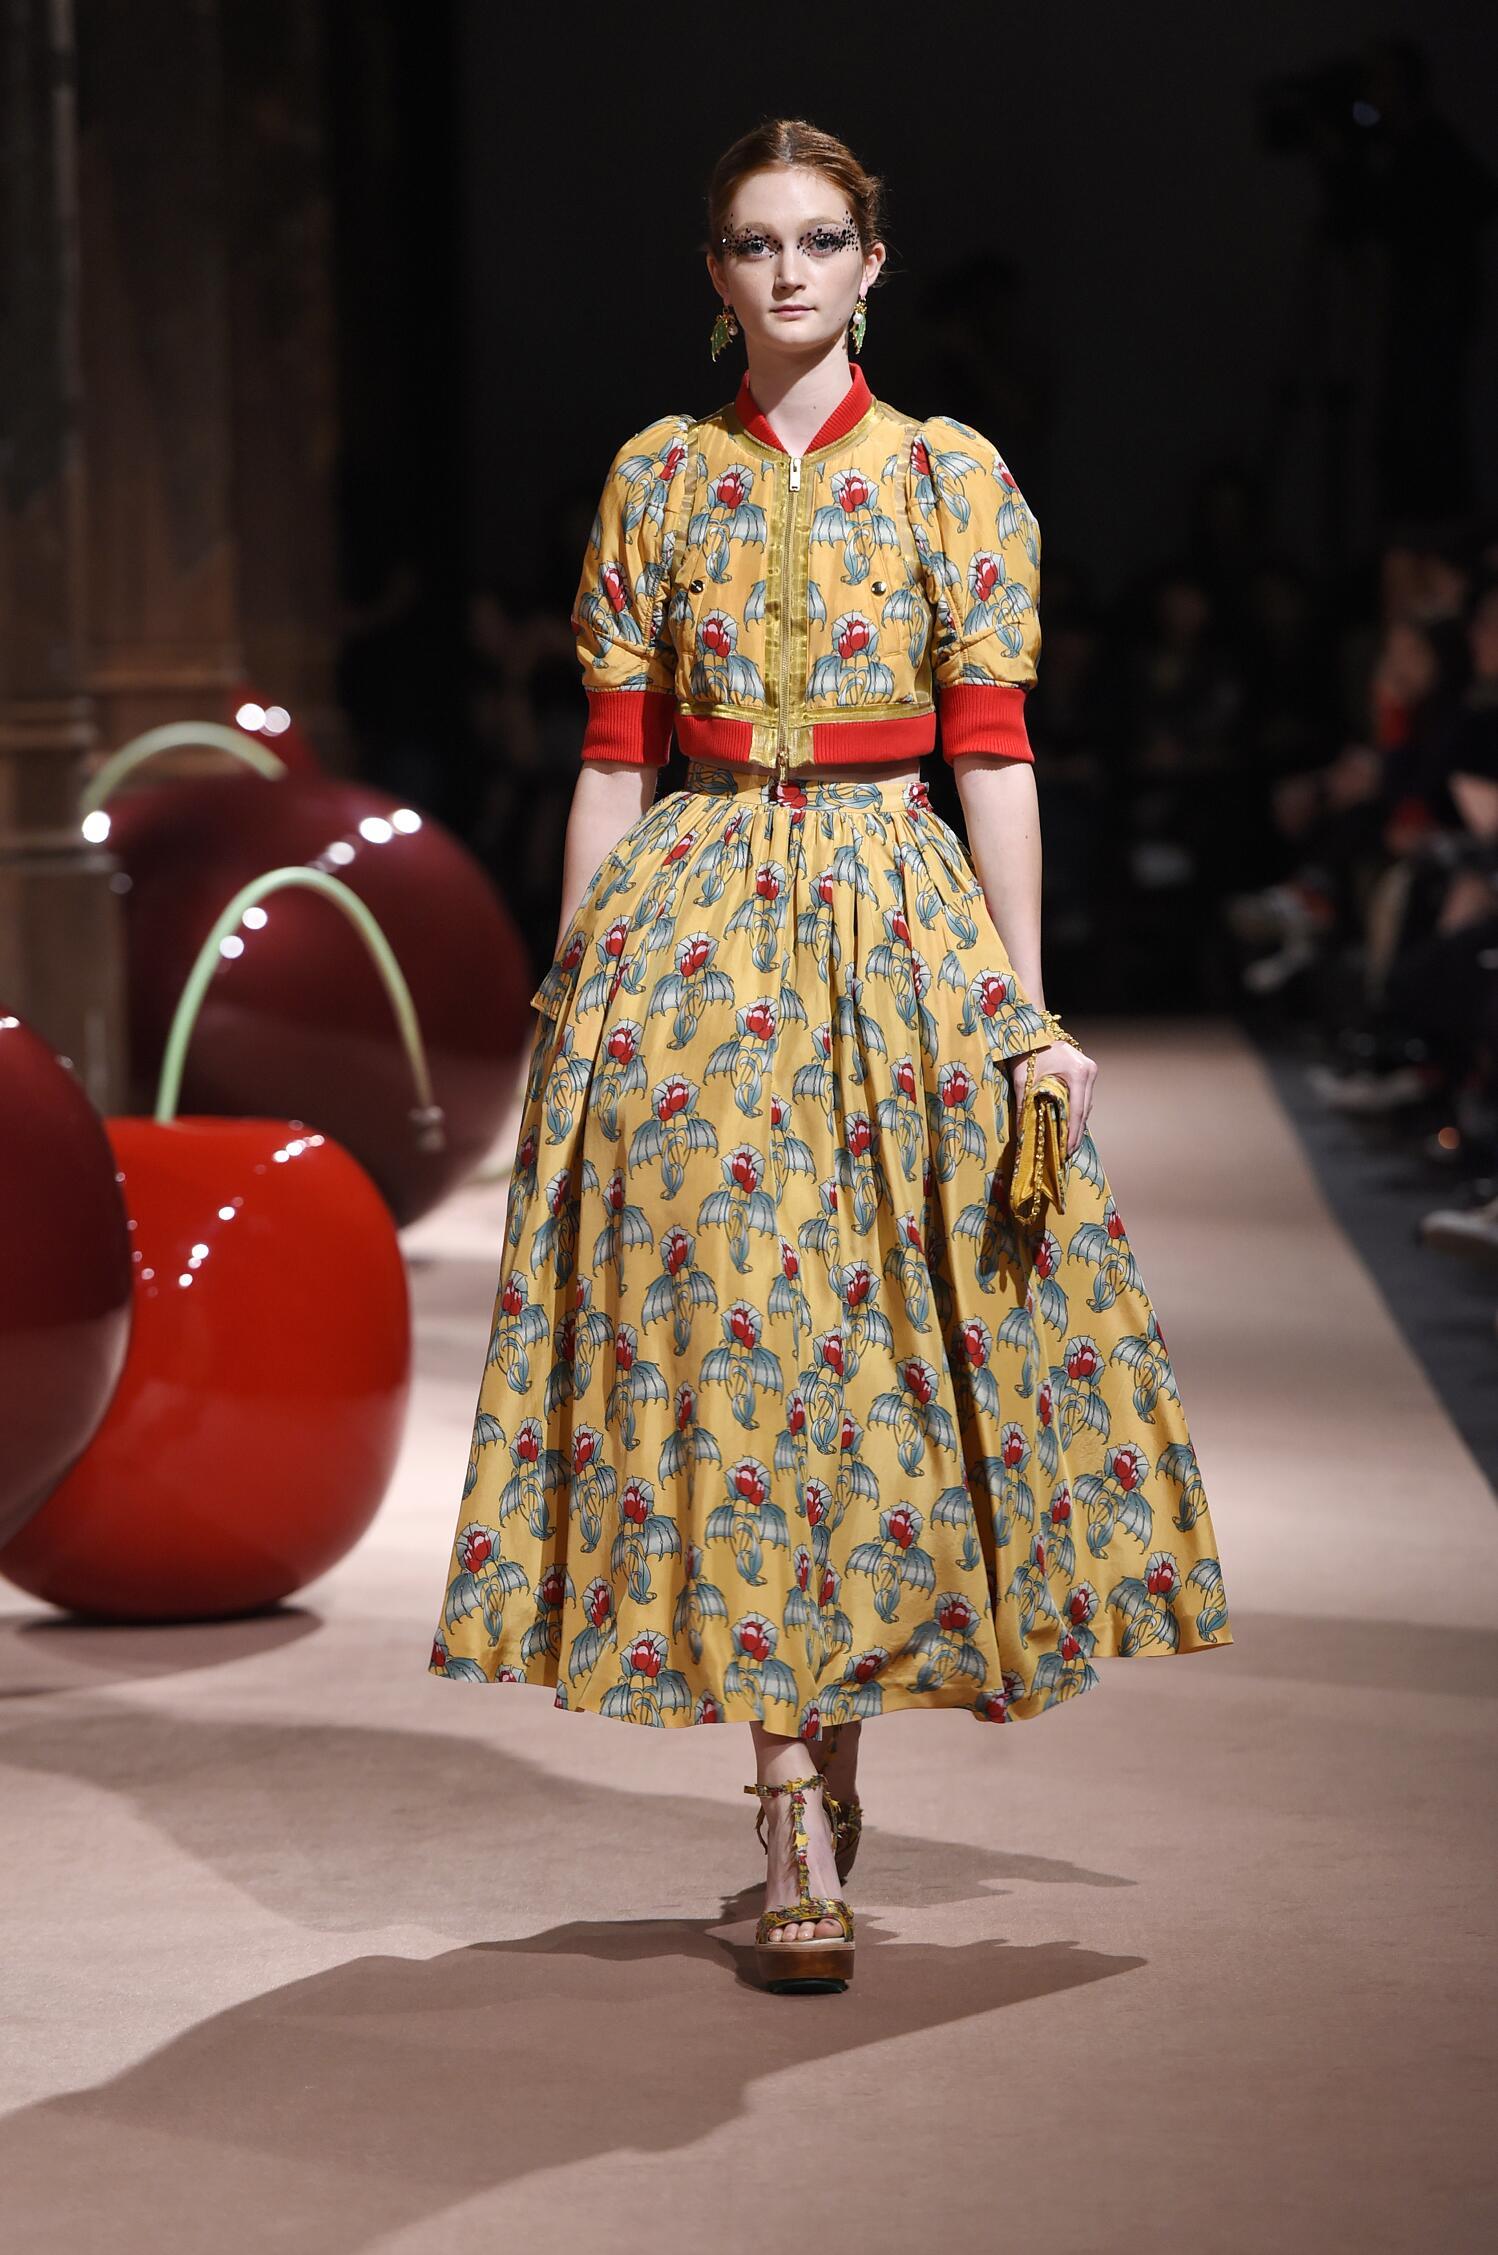 Fashion Woman Model Undercover Catwalk